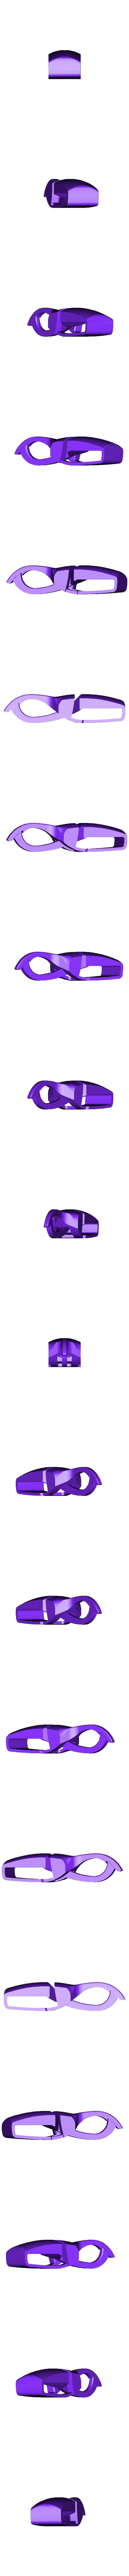 beetle clothespin.STL Download STL file Beetle clothespin • 3D printer design, lucasfernandesbos